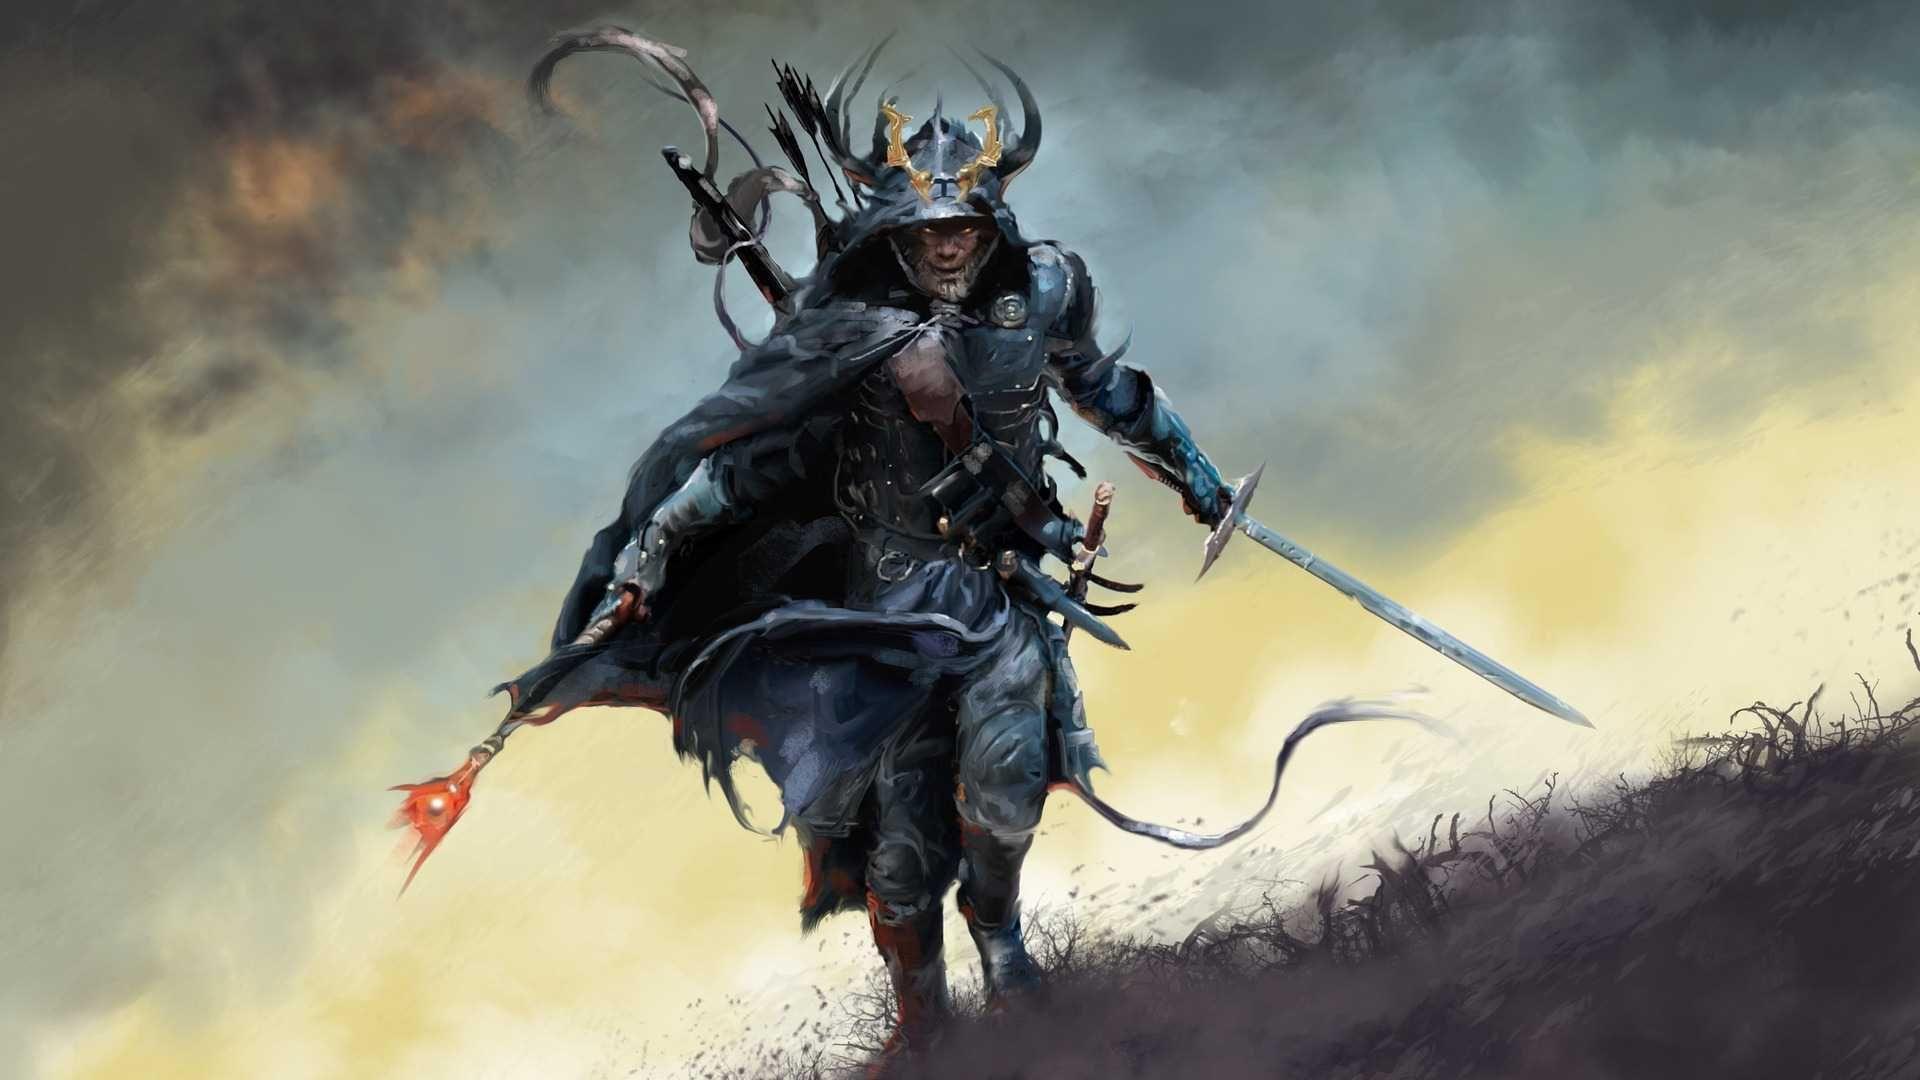 Japanese Samurai Warriors Wallpapers Top Free Japanese Samurai Warriors Backgrounds Wallpaperaccess